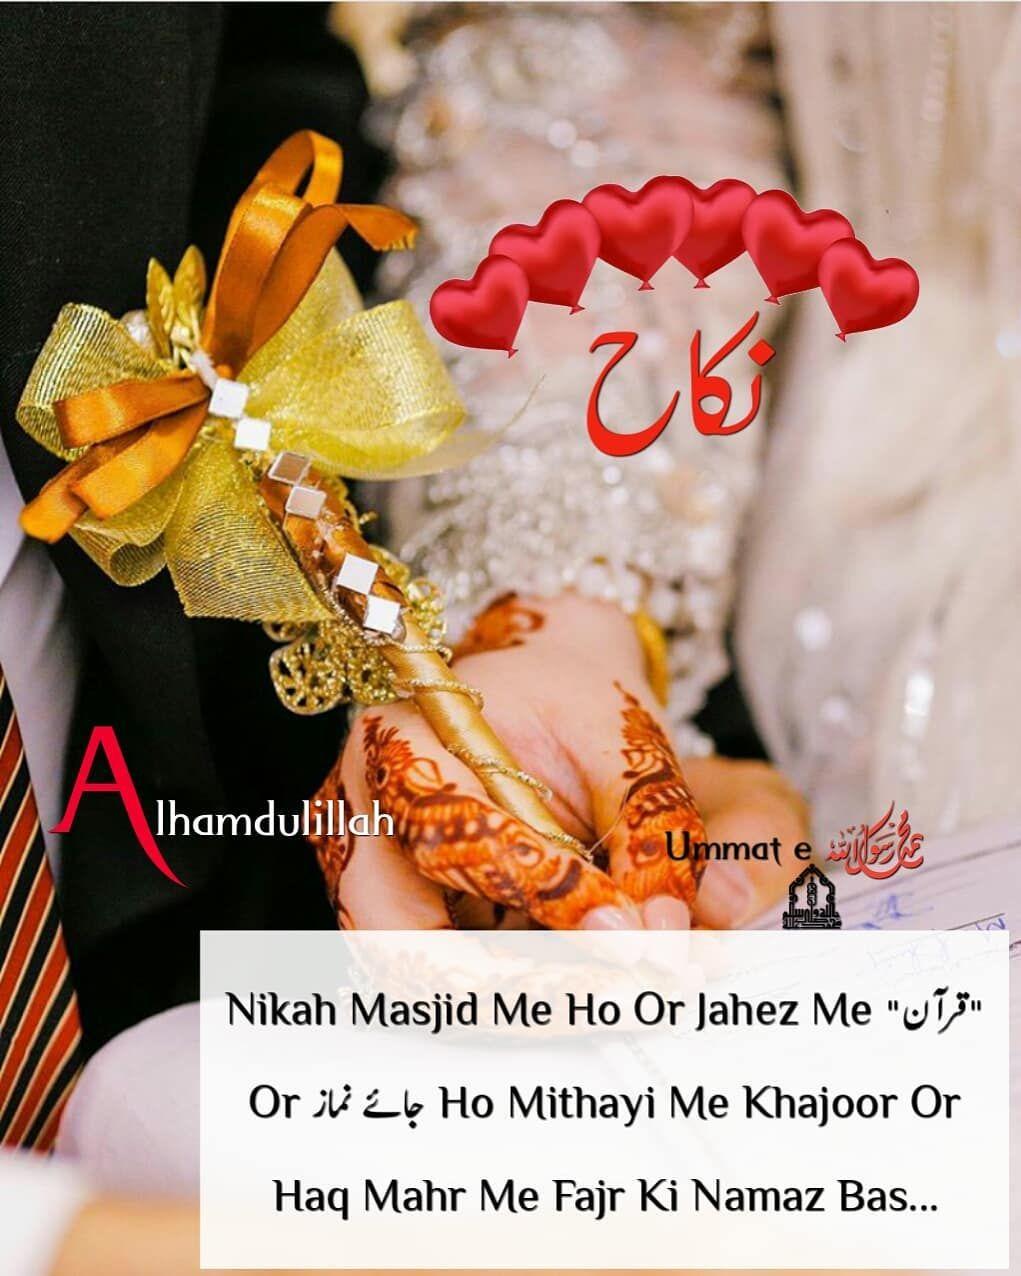 Alhamdulillah Kaash Log Aisa Nikah Shuru Kar De Muslim Love Quotes Islamic Inspirational Quotes Best Couple Quotes